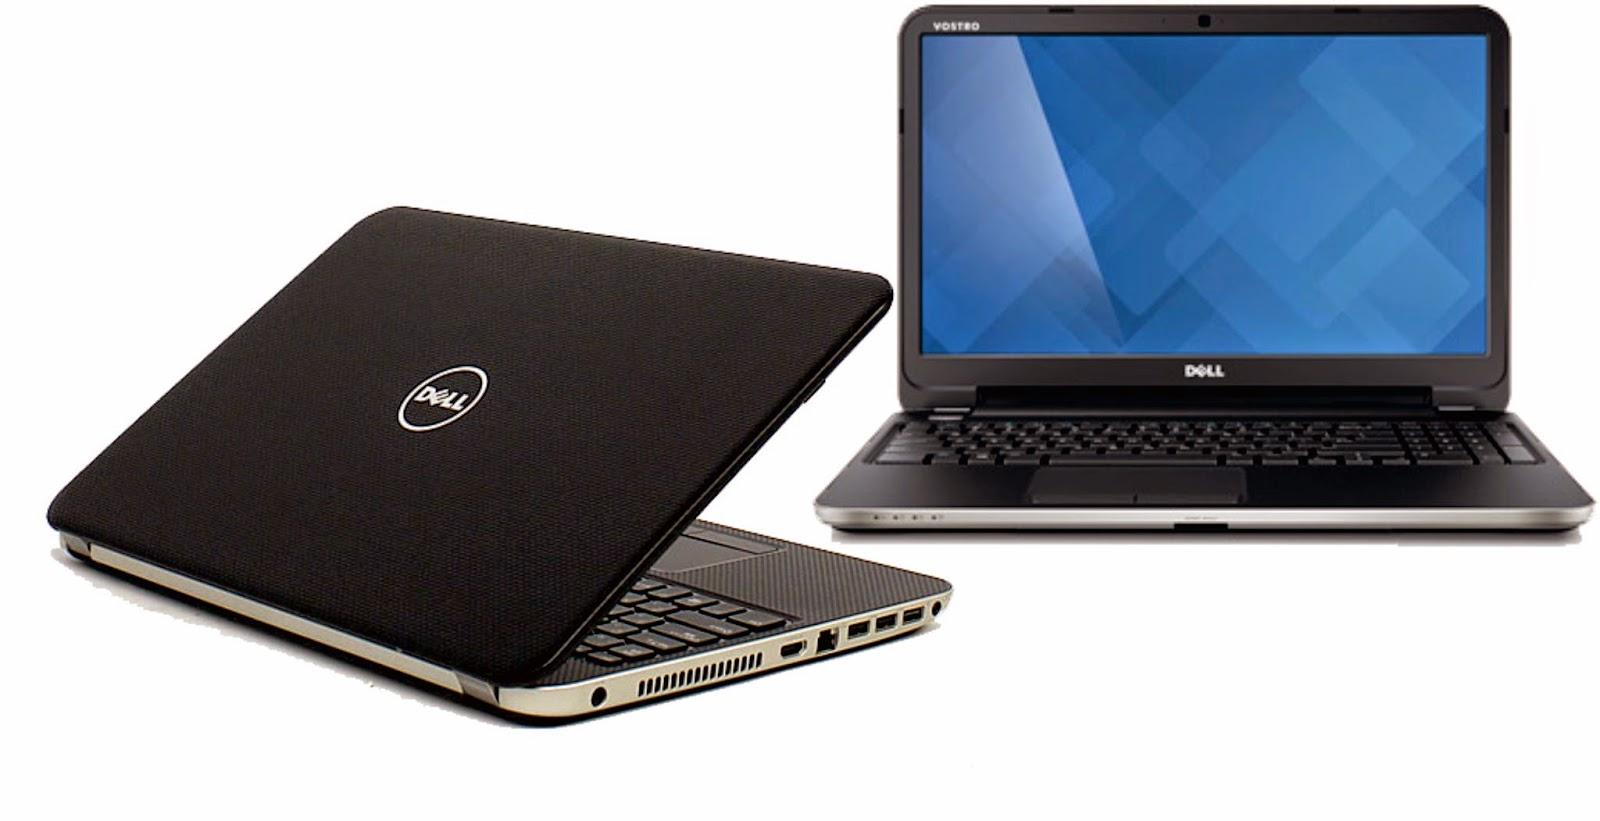 Dell WiFi drivers Win7 7 32 bit Inspiron N4010 zip / Disc drivers